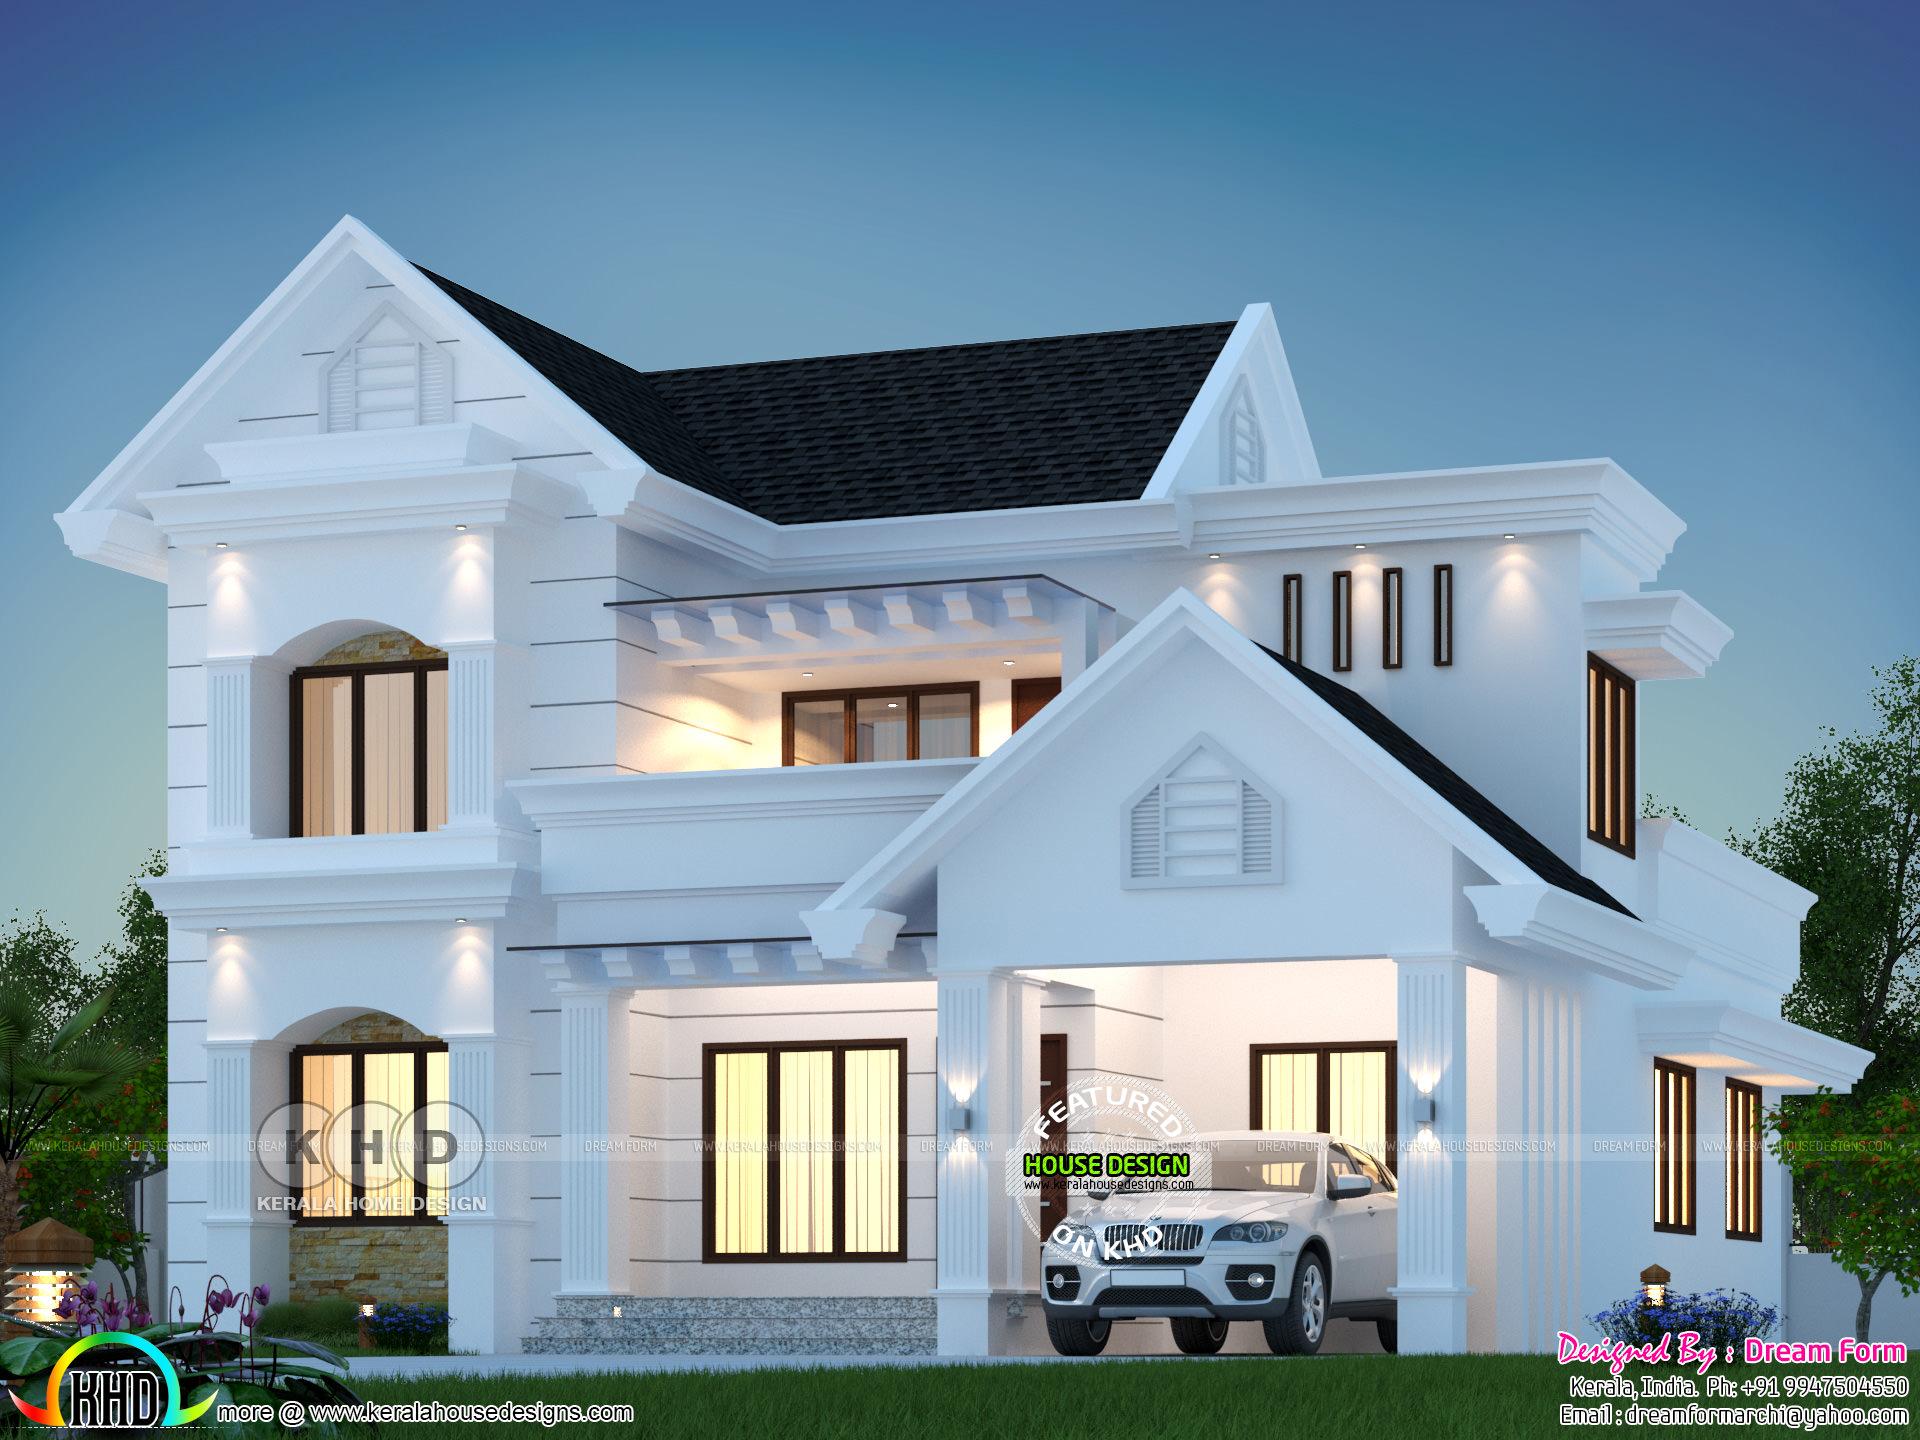 December 2019 House Designs Starts Here Kerala Home Design Bloglovin